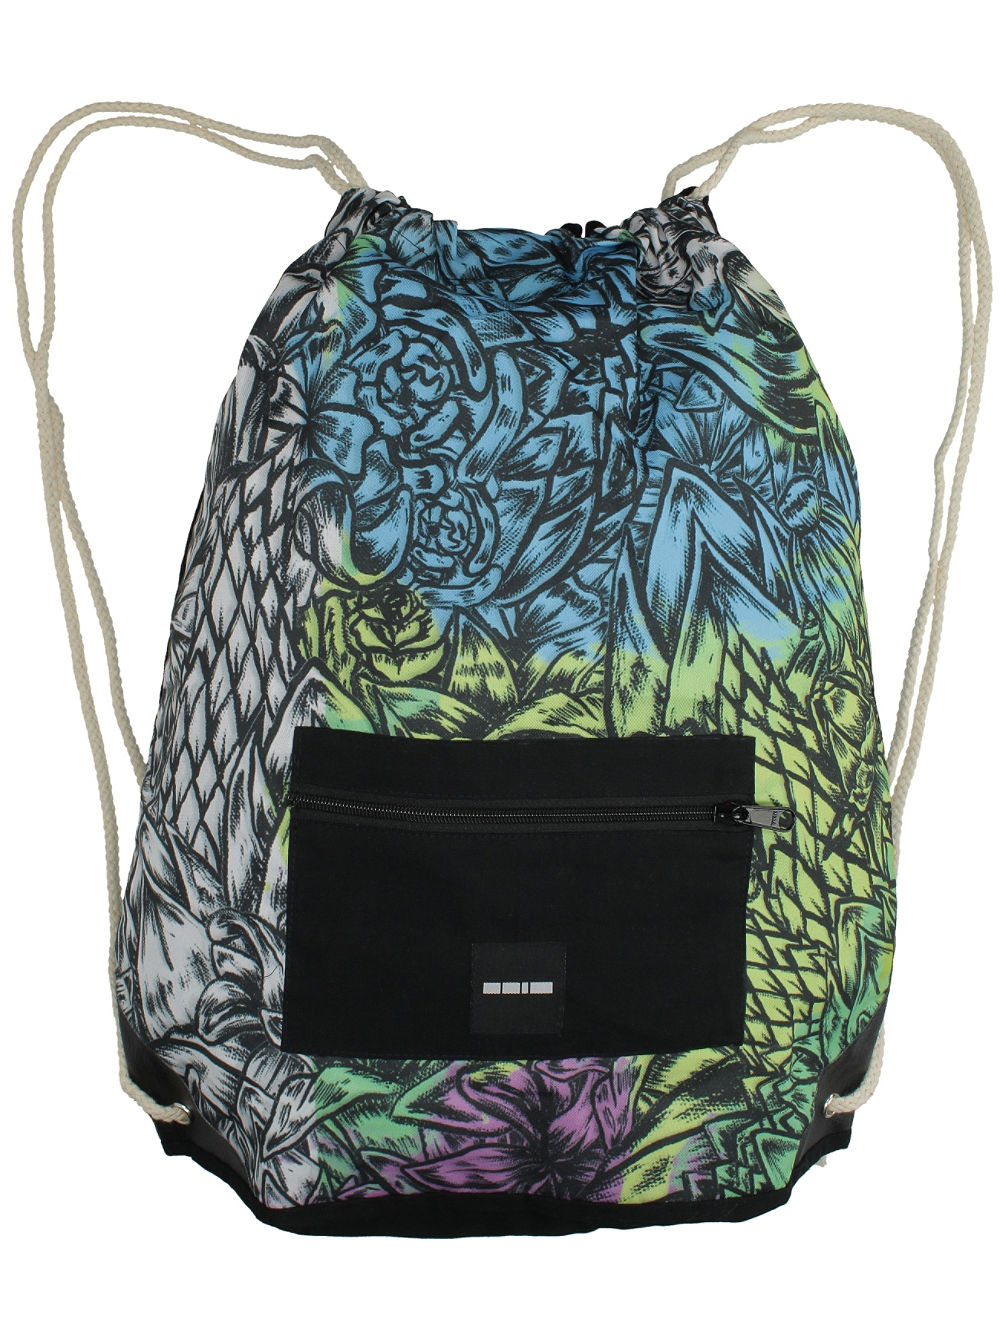 nnim-clothing-the-keeper-backpack